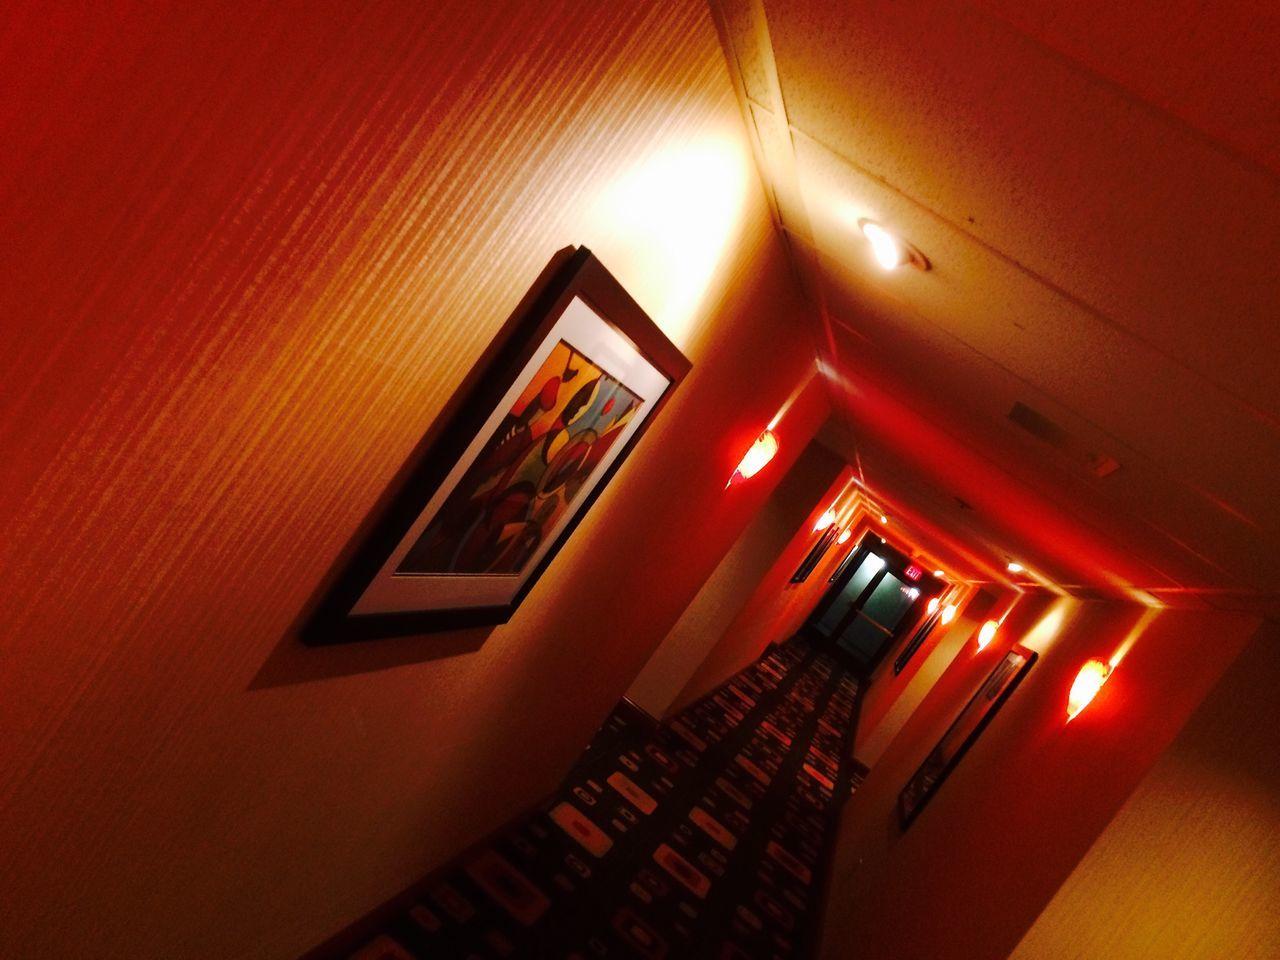 indoors, illuminated, communication, no people, book, close-up, technology, day